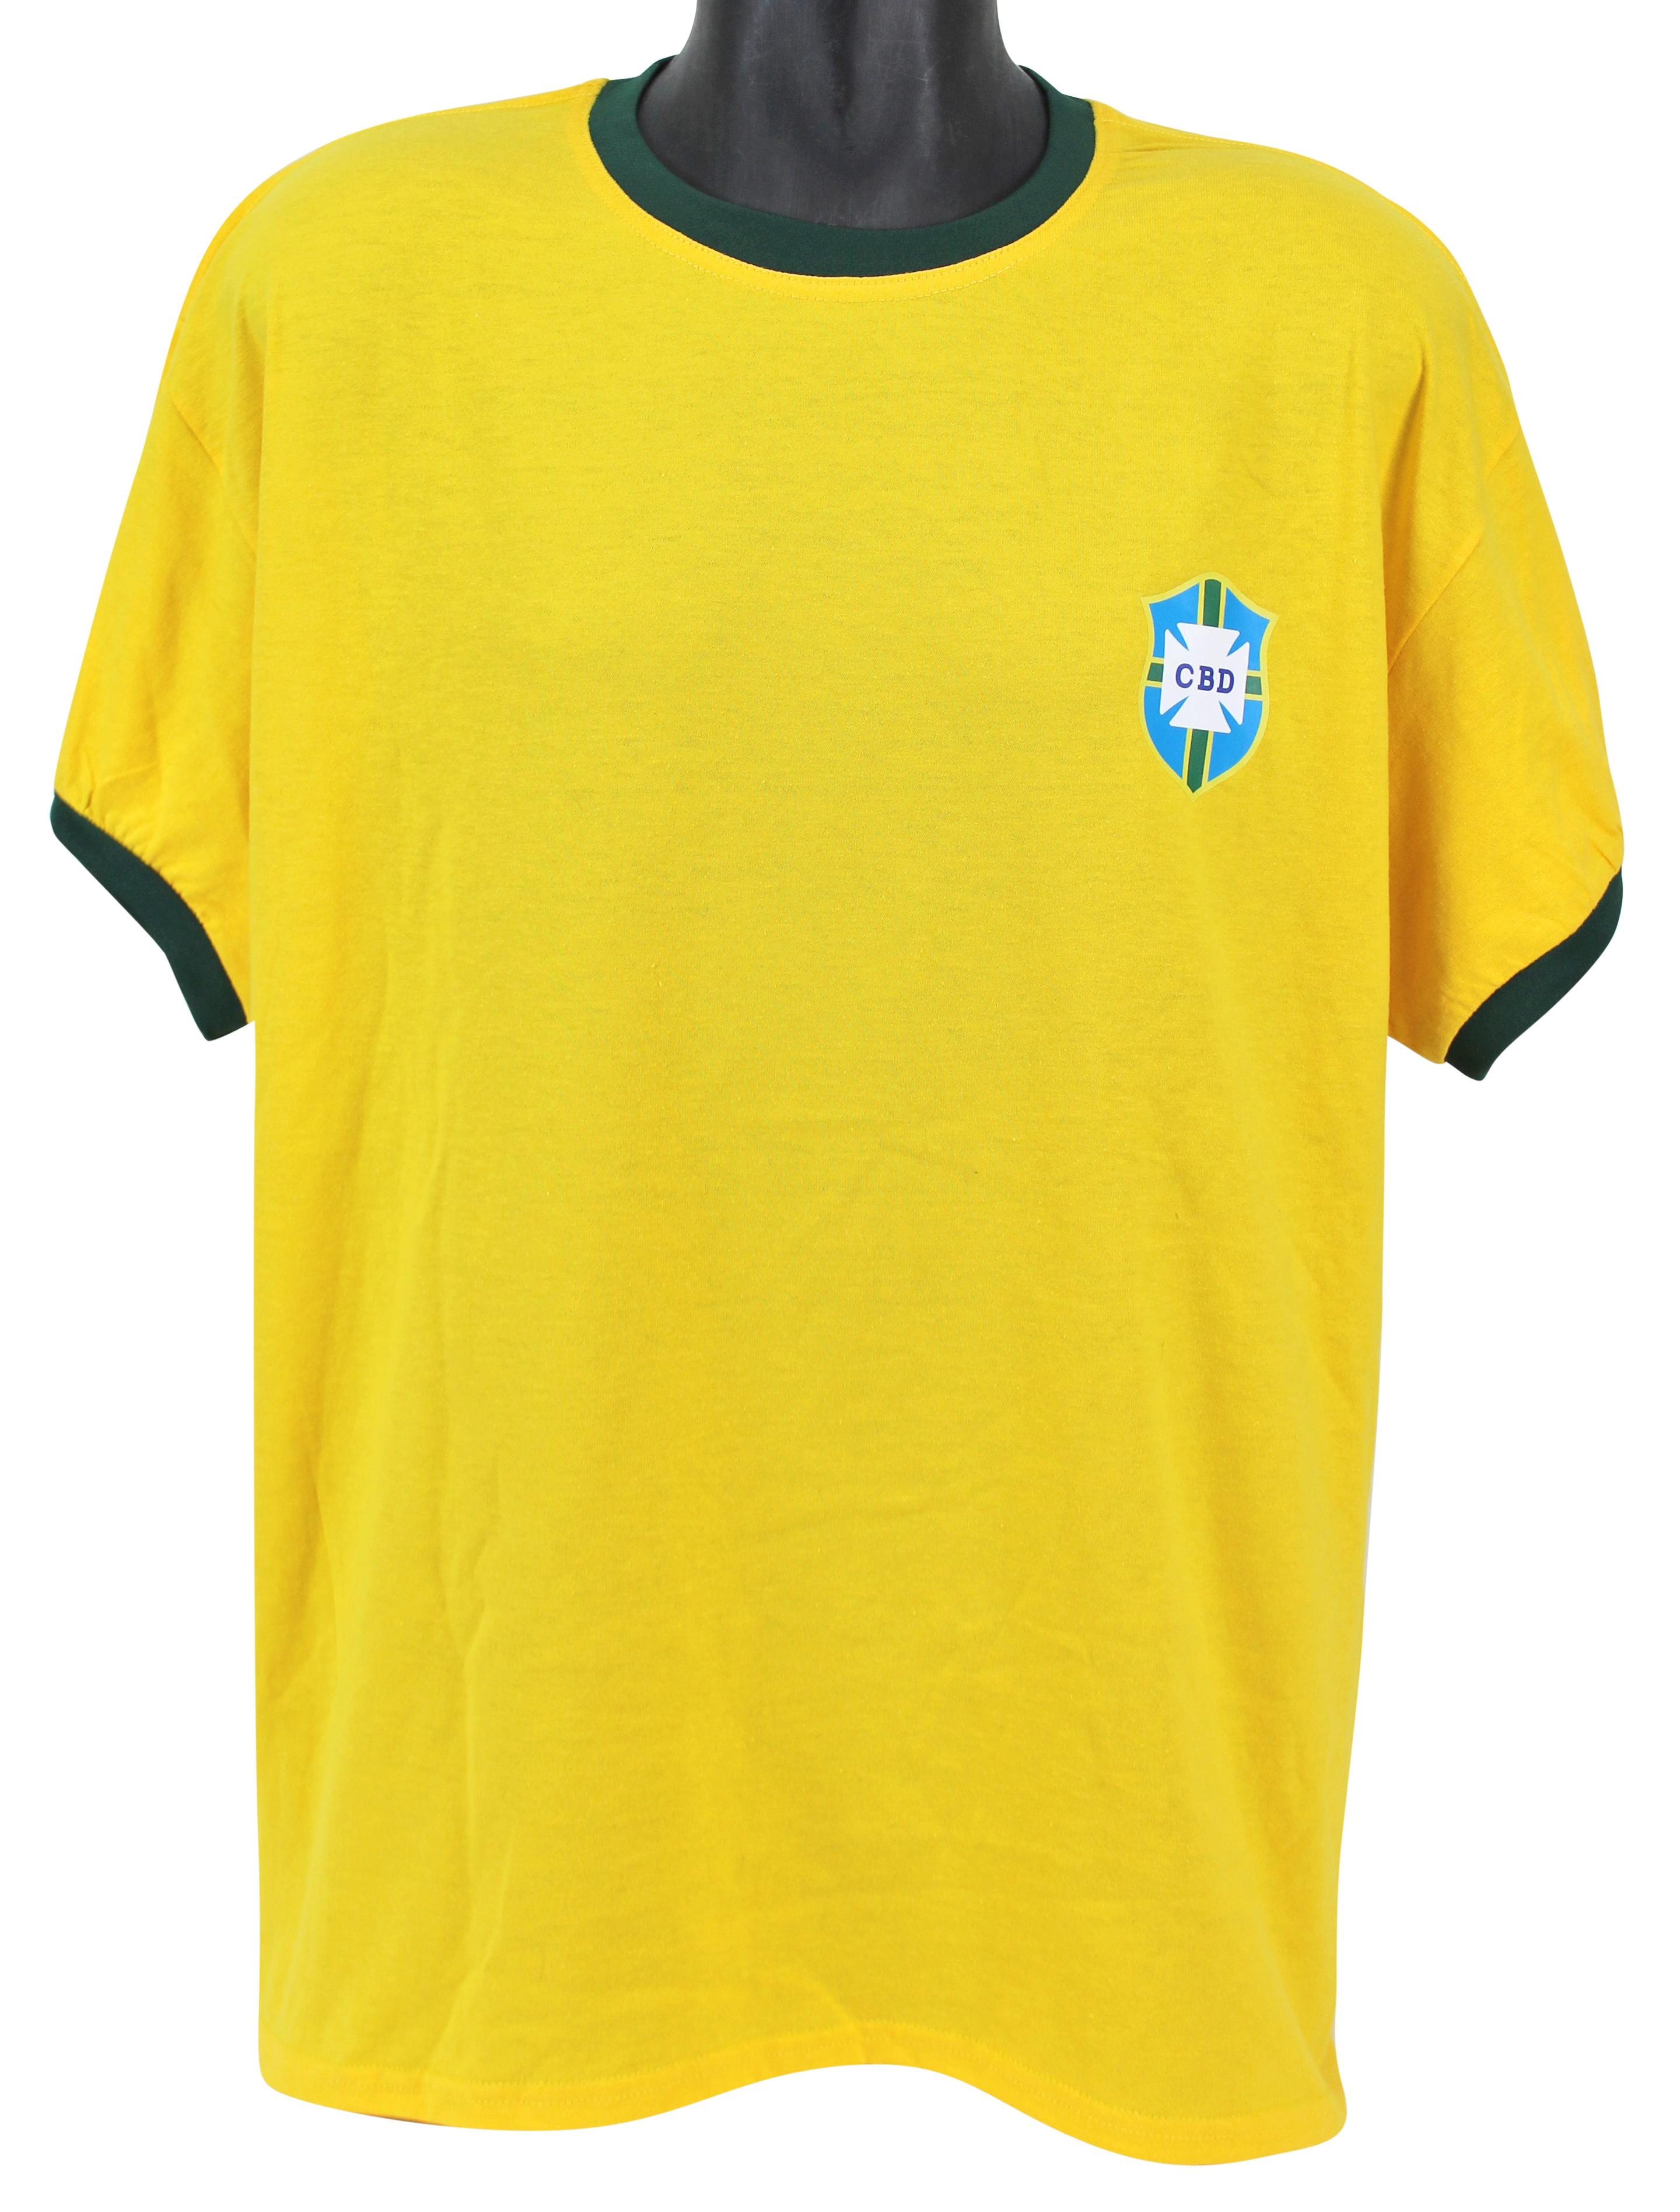 c4bd856cd32 ... Edson Pele Signed Brazilian Soccer Jersey with RARE Full Autograph (PSA/ DNA) ...